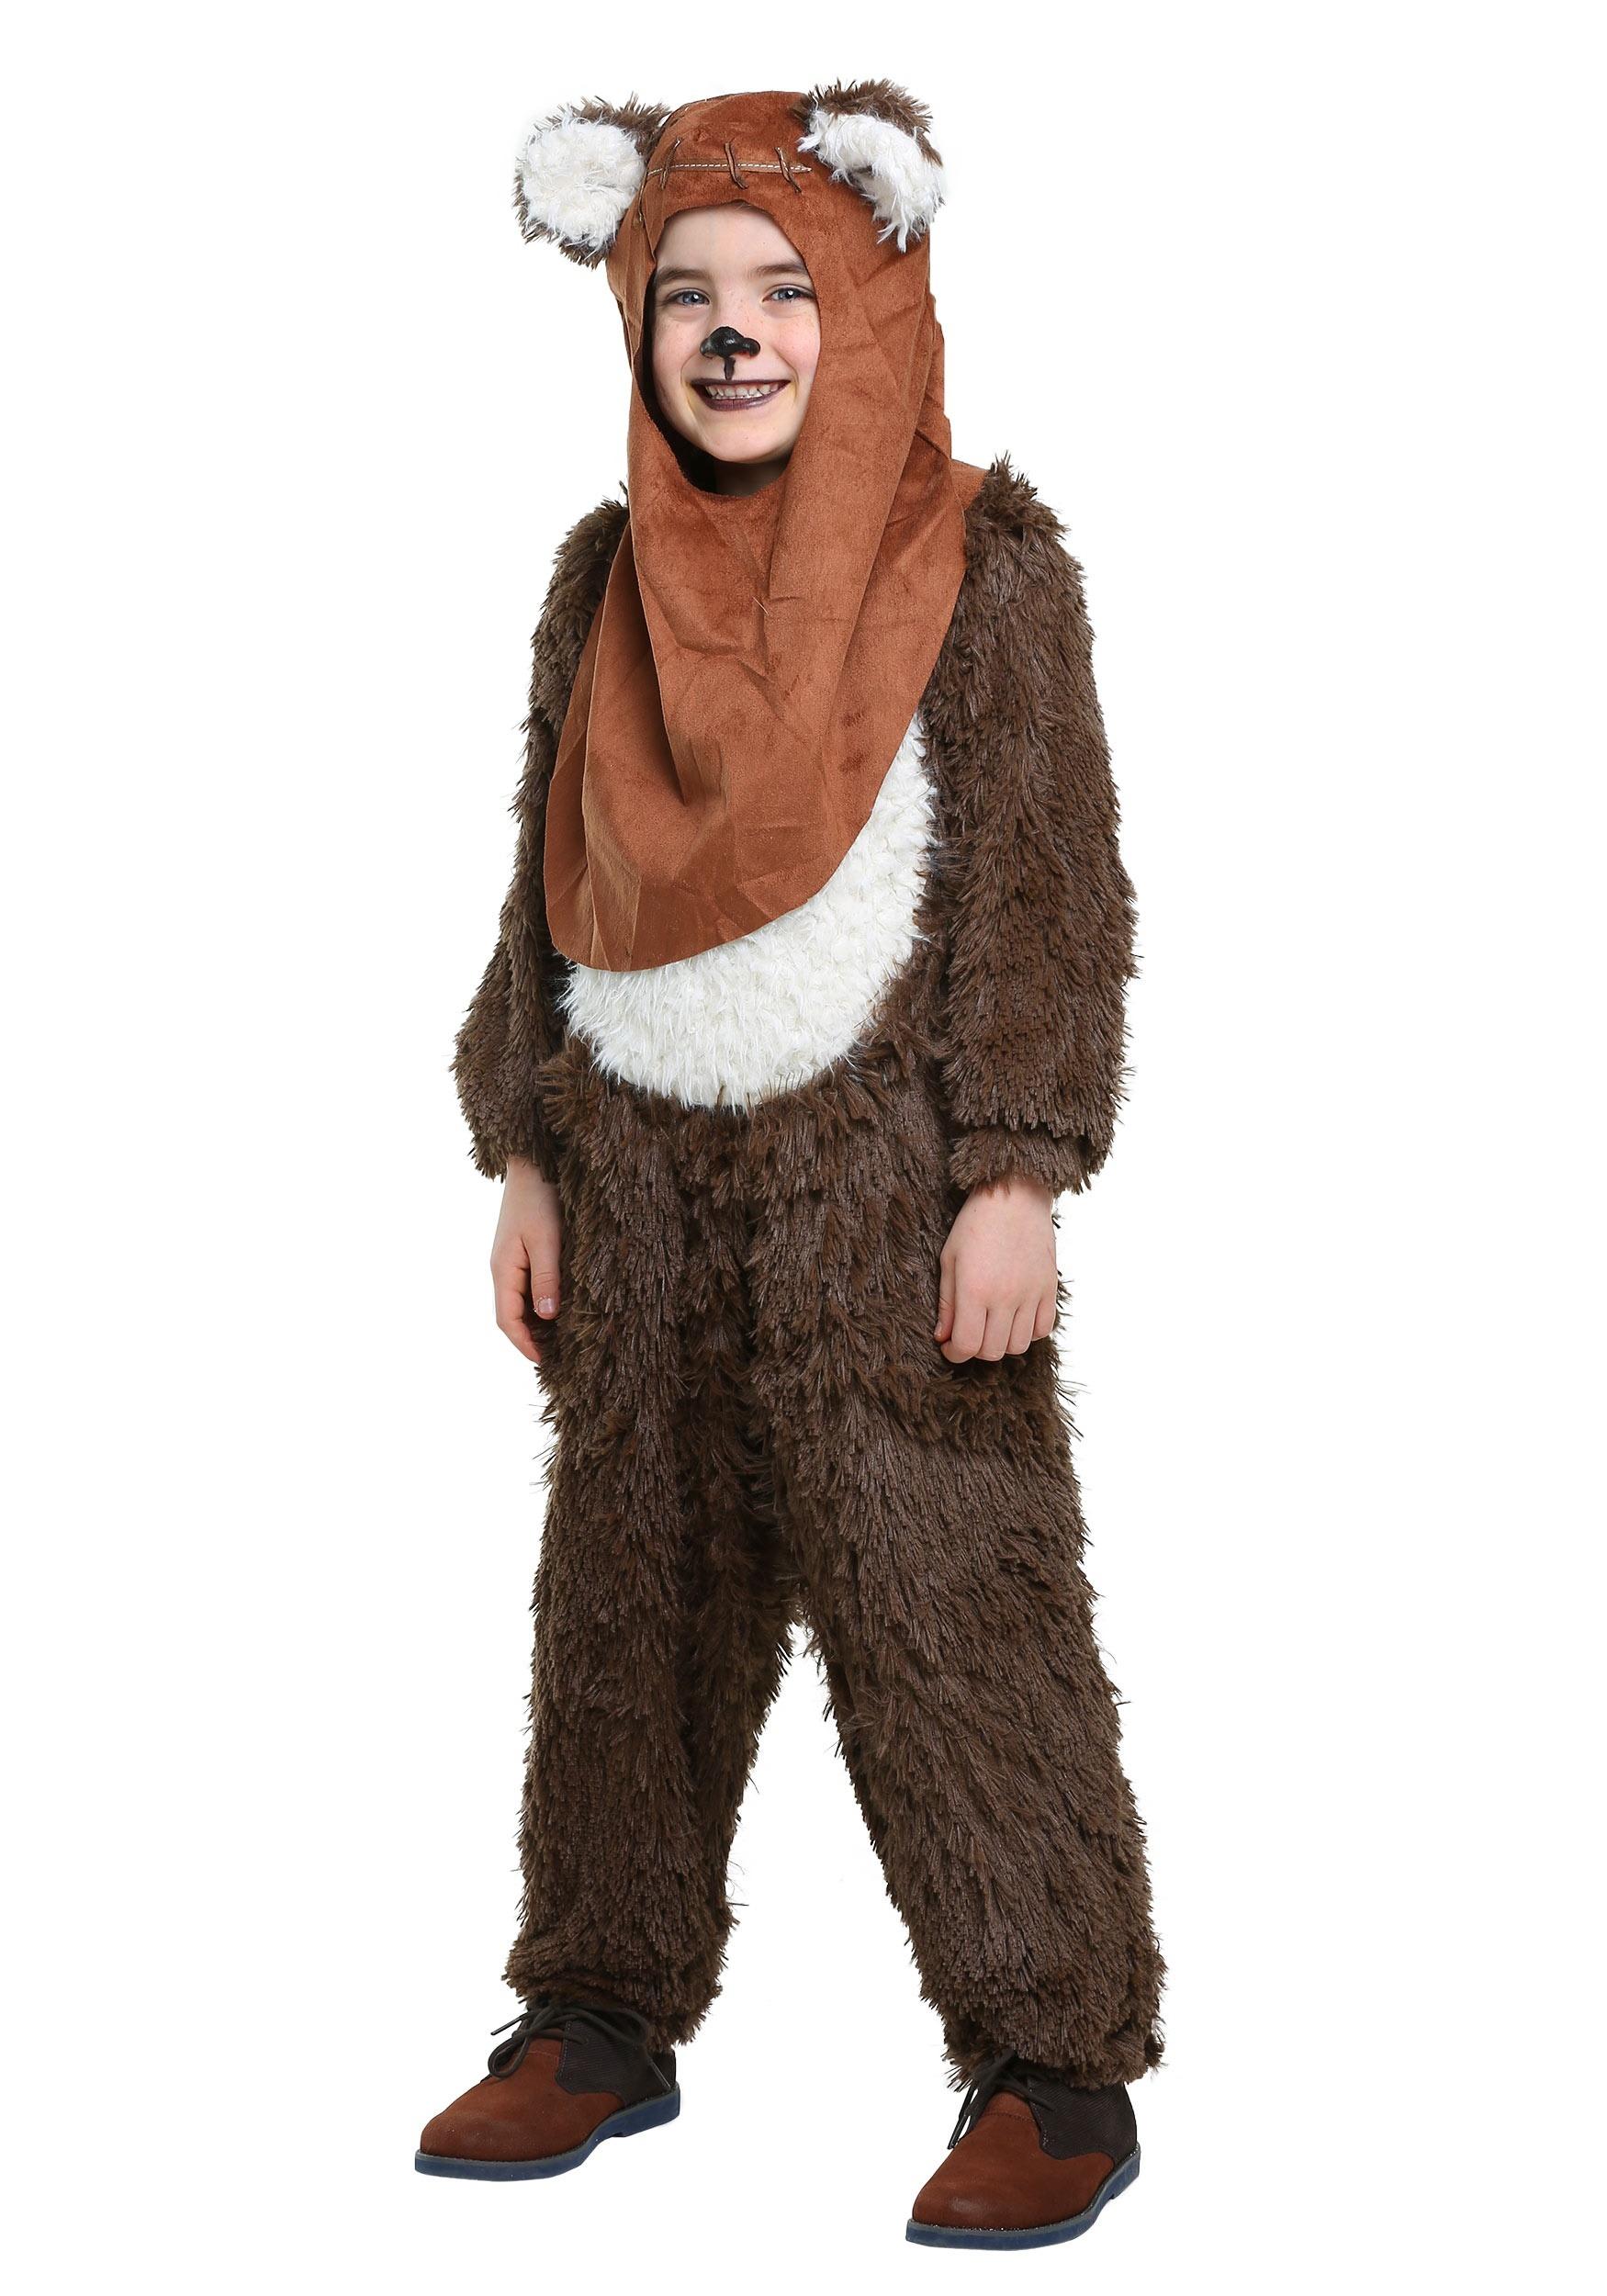 Child Deluxe Wicket/Ewok Costume | Warm Halloween Costume